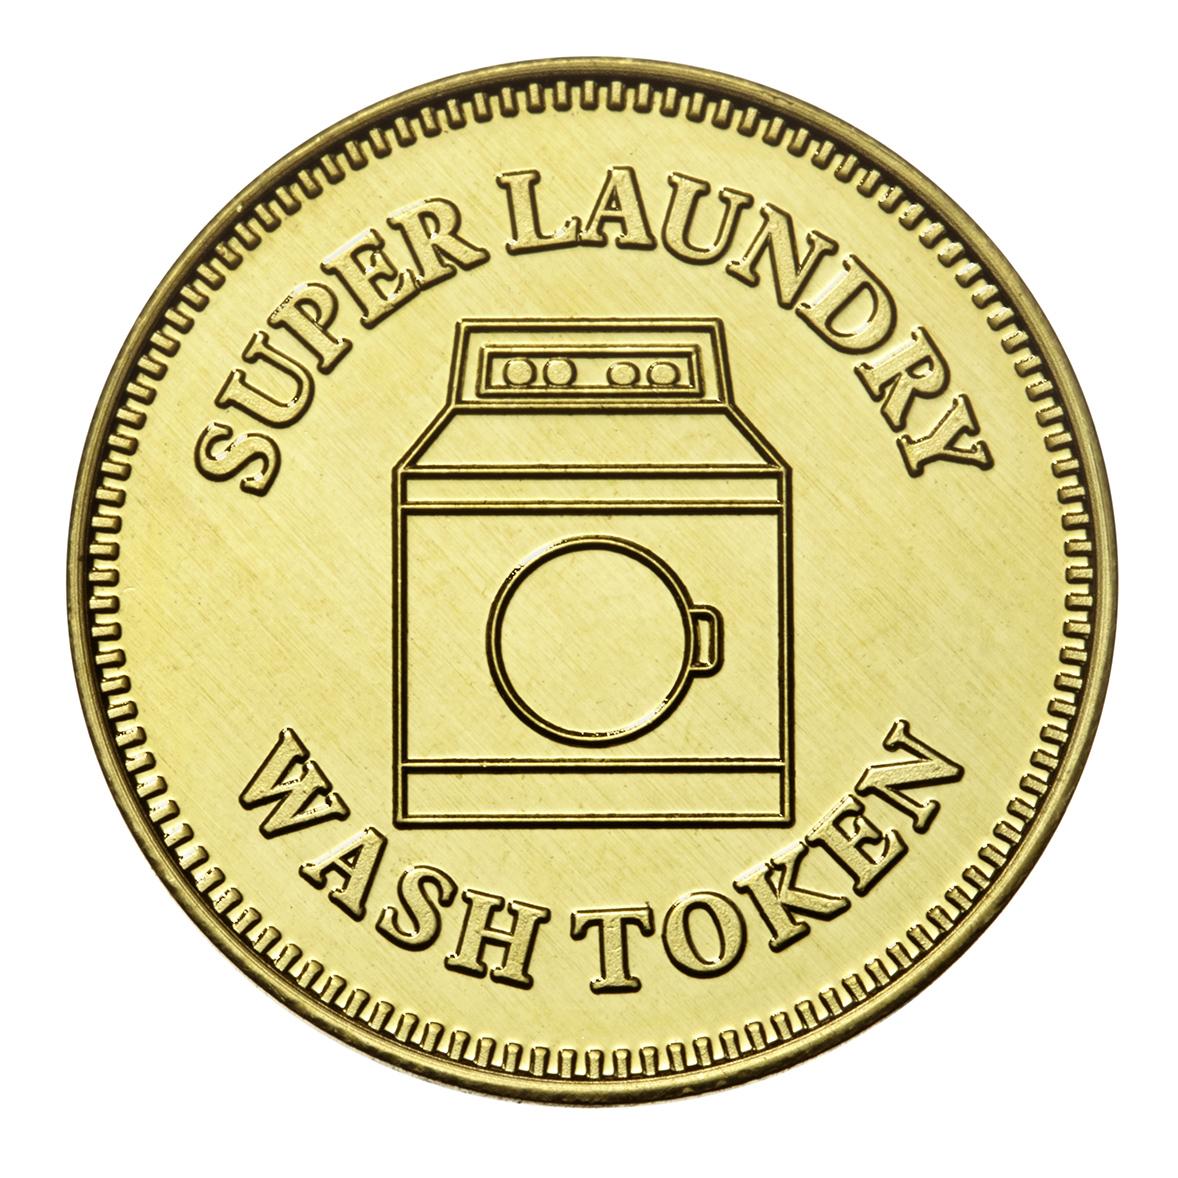 Super Laundry Wash Token